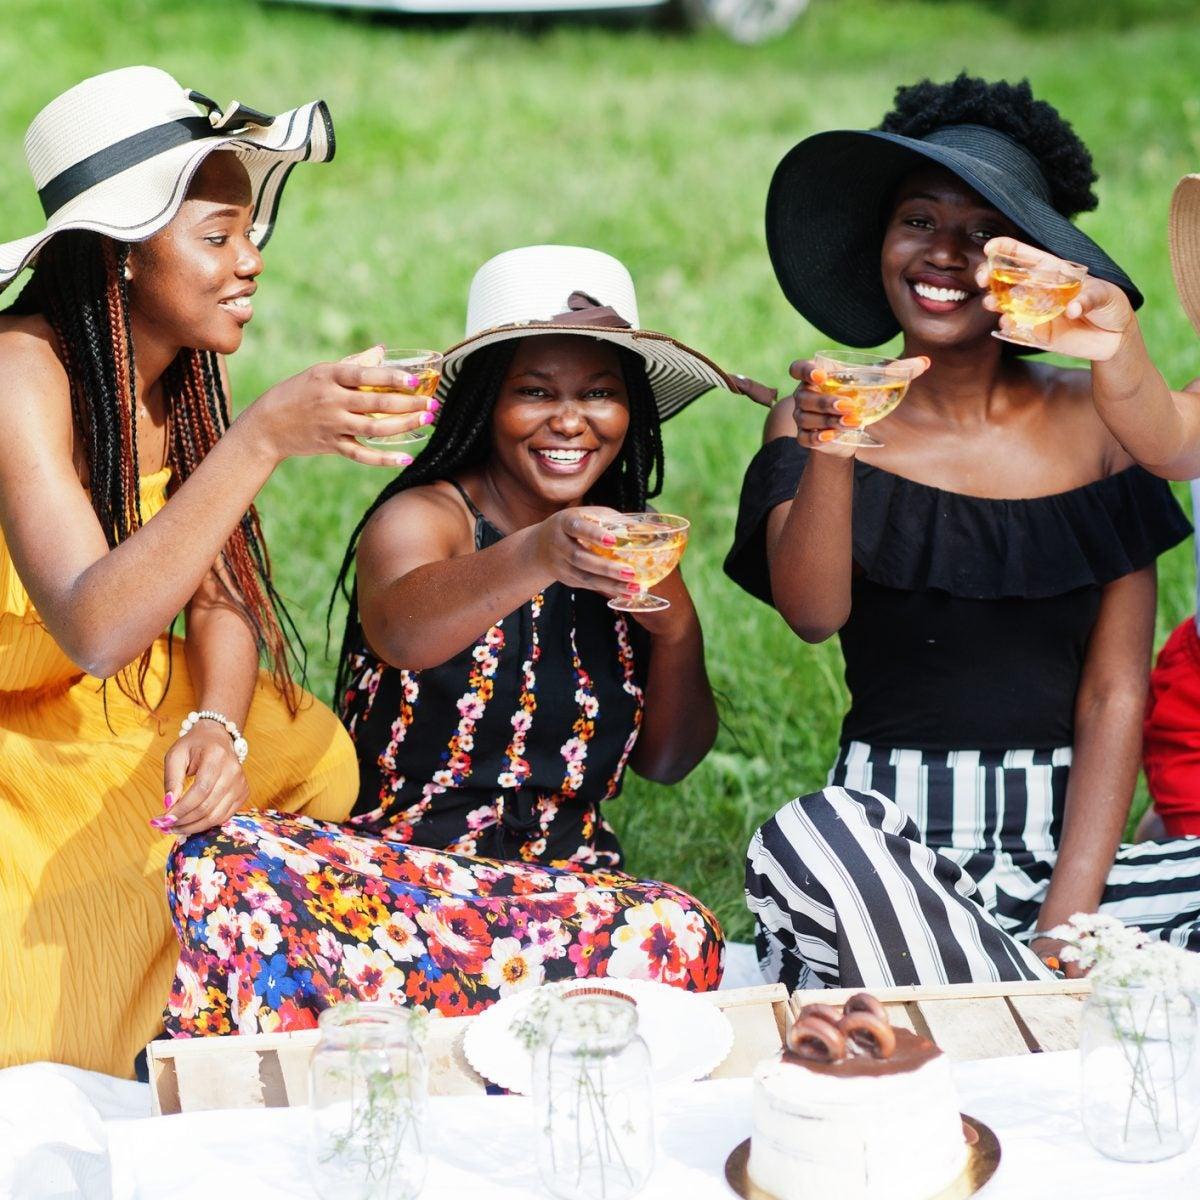 #MakingItWork: 5 Socially Distant Bachelorette Destination Ideas